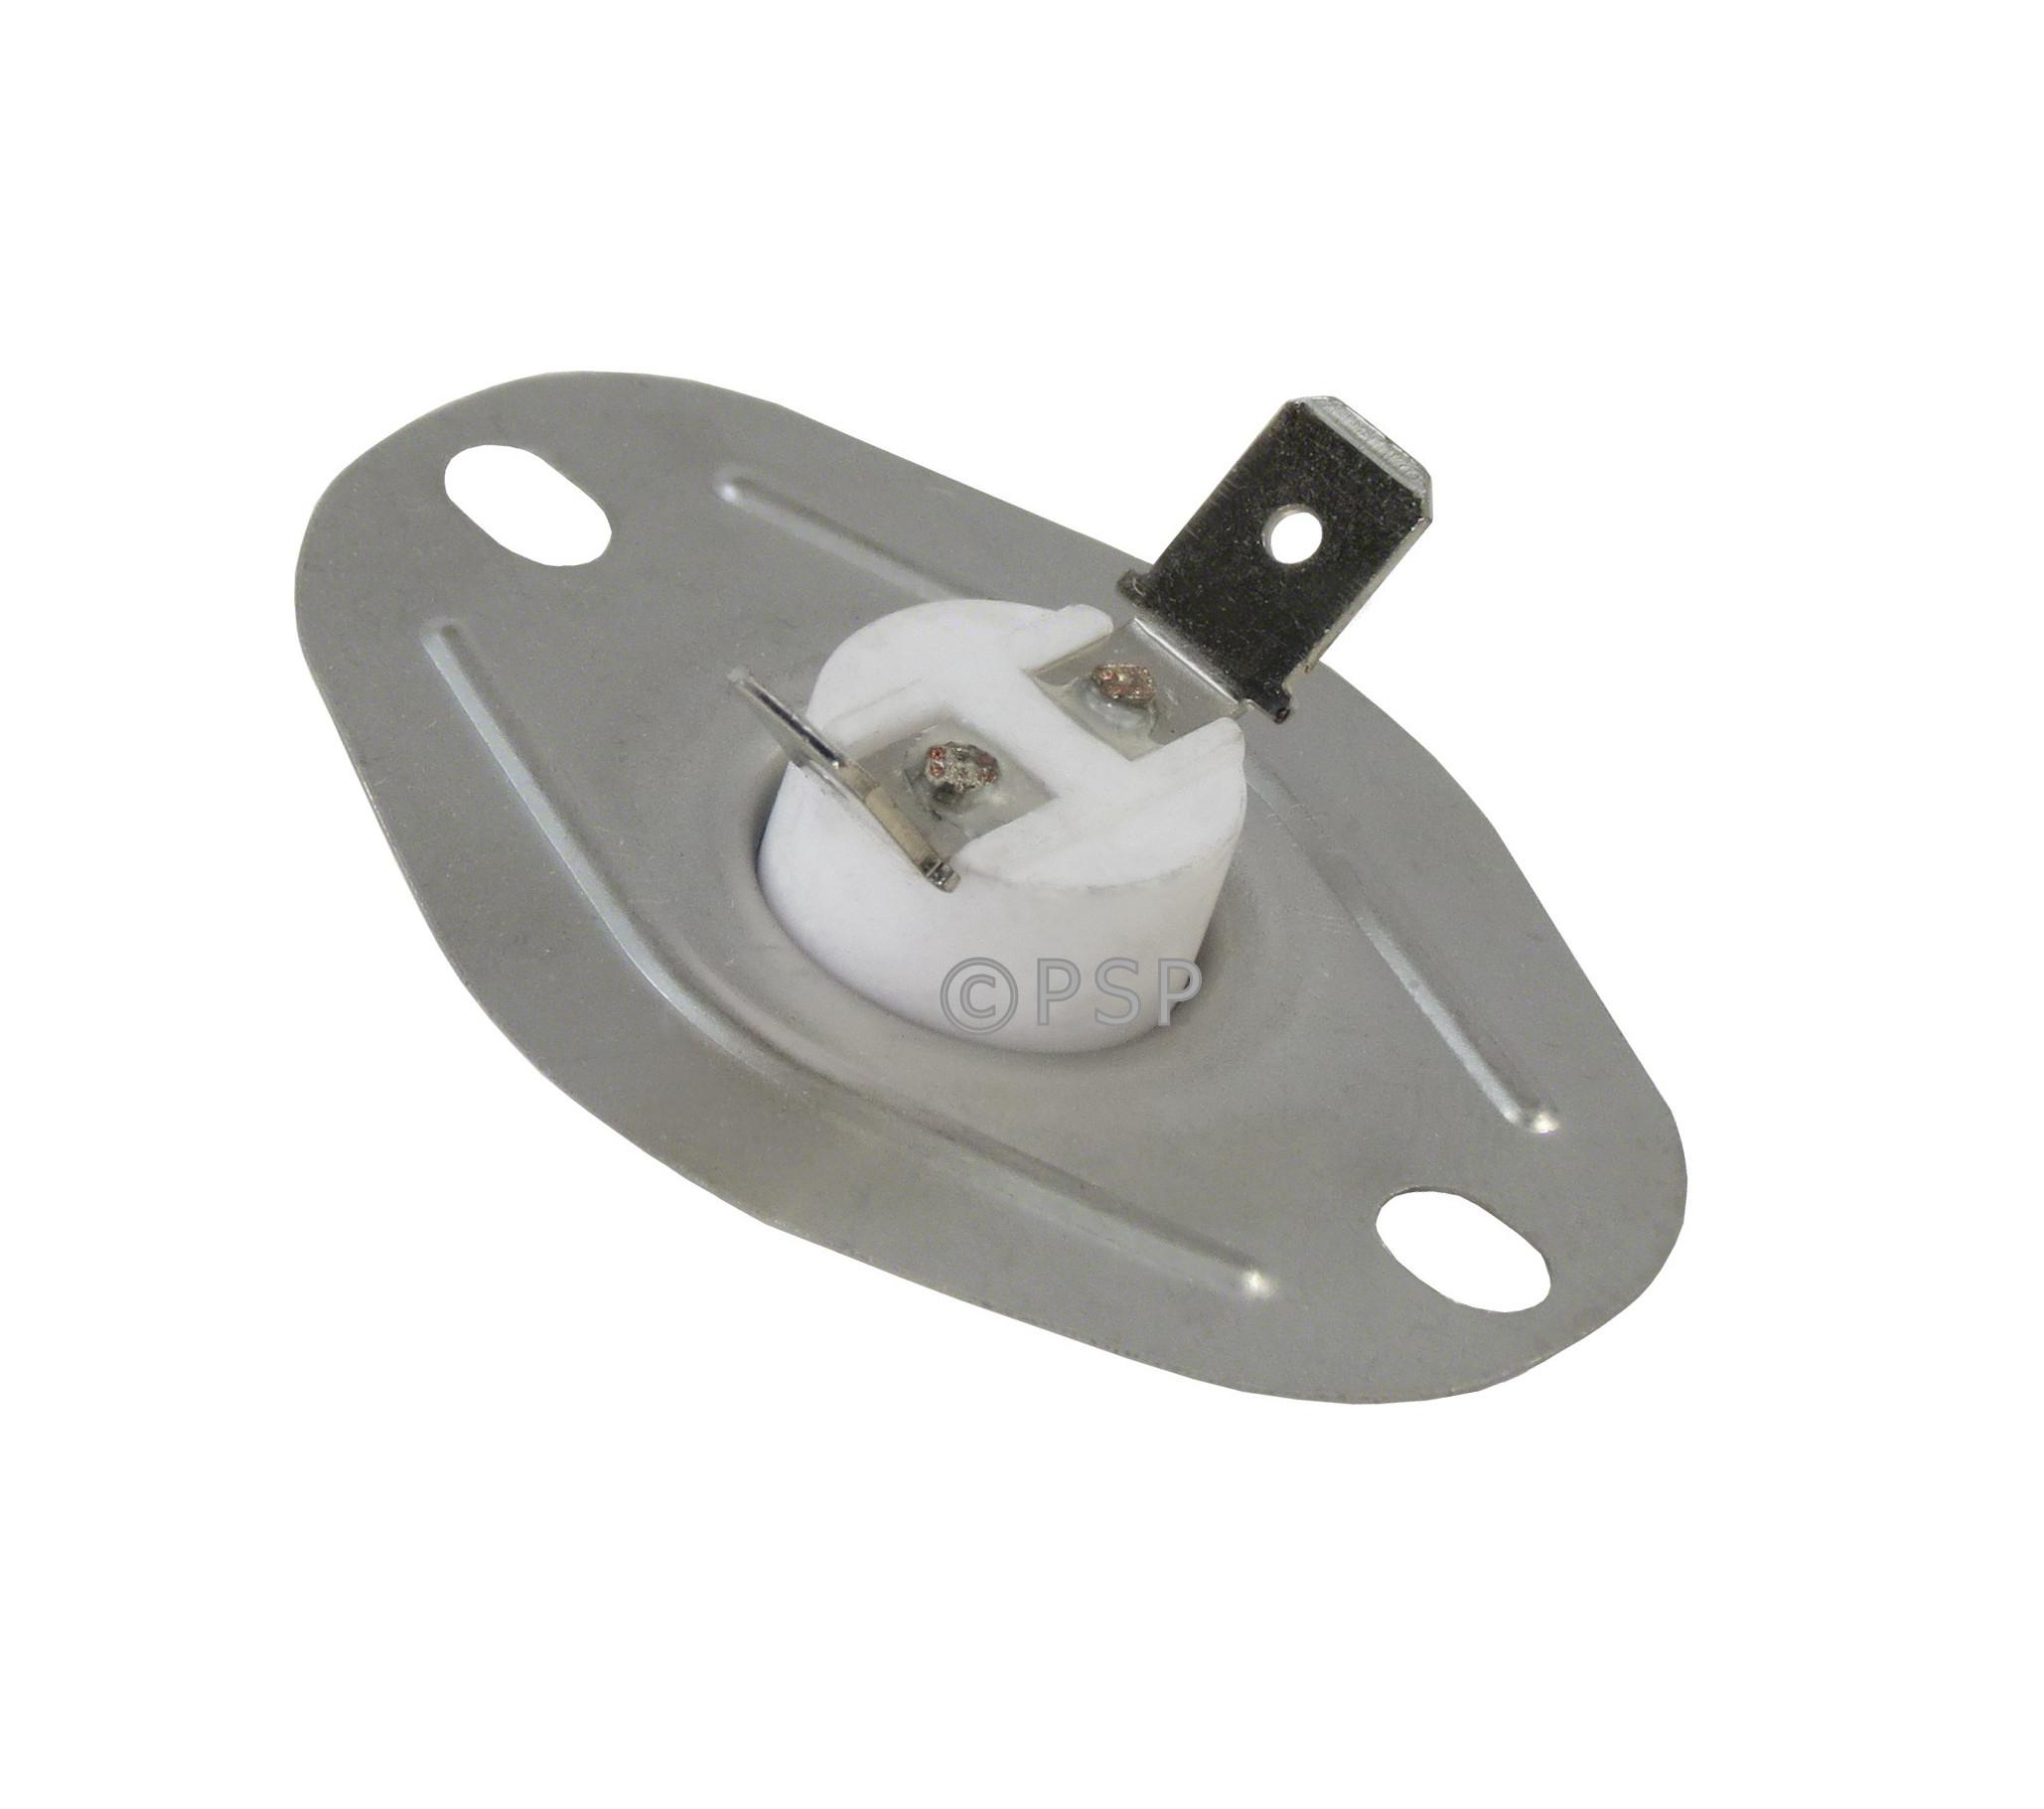 Enviro Vista-Flame 120F Blower-Fan Sensor EC-001